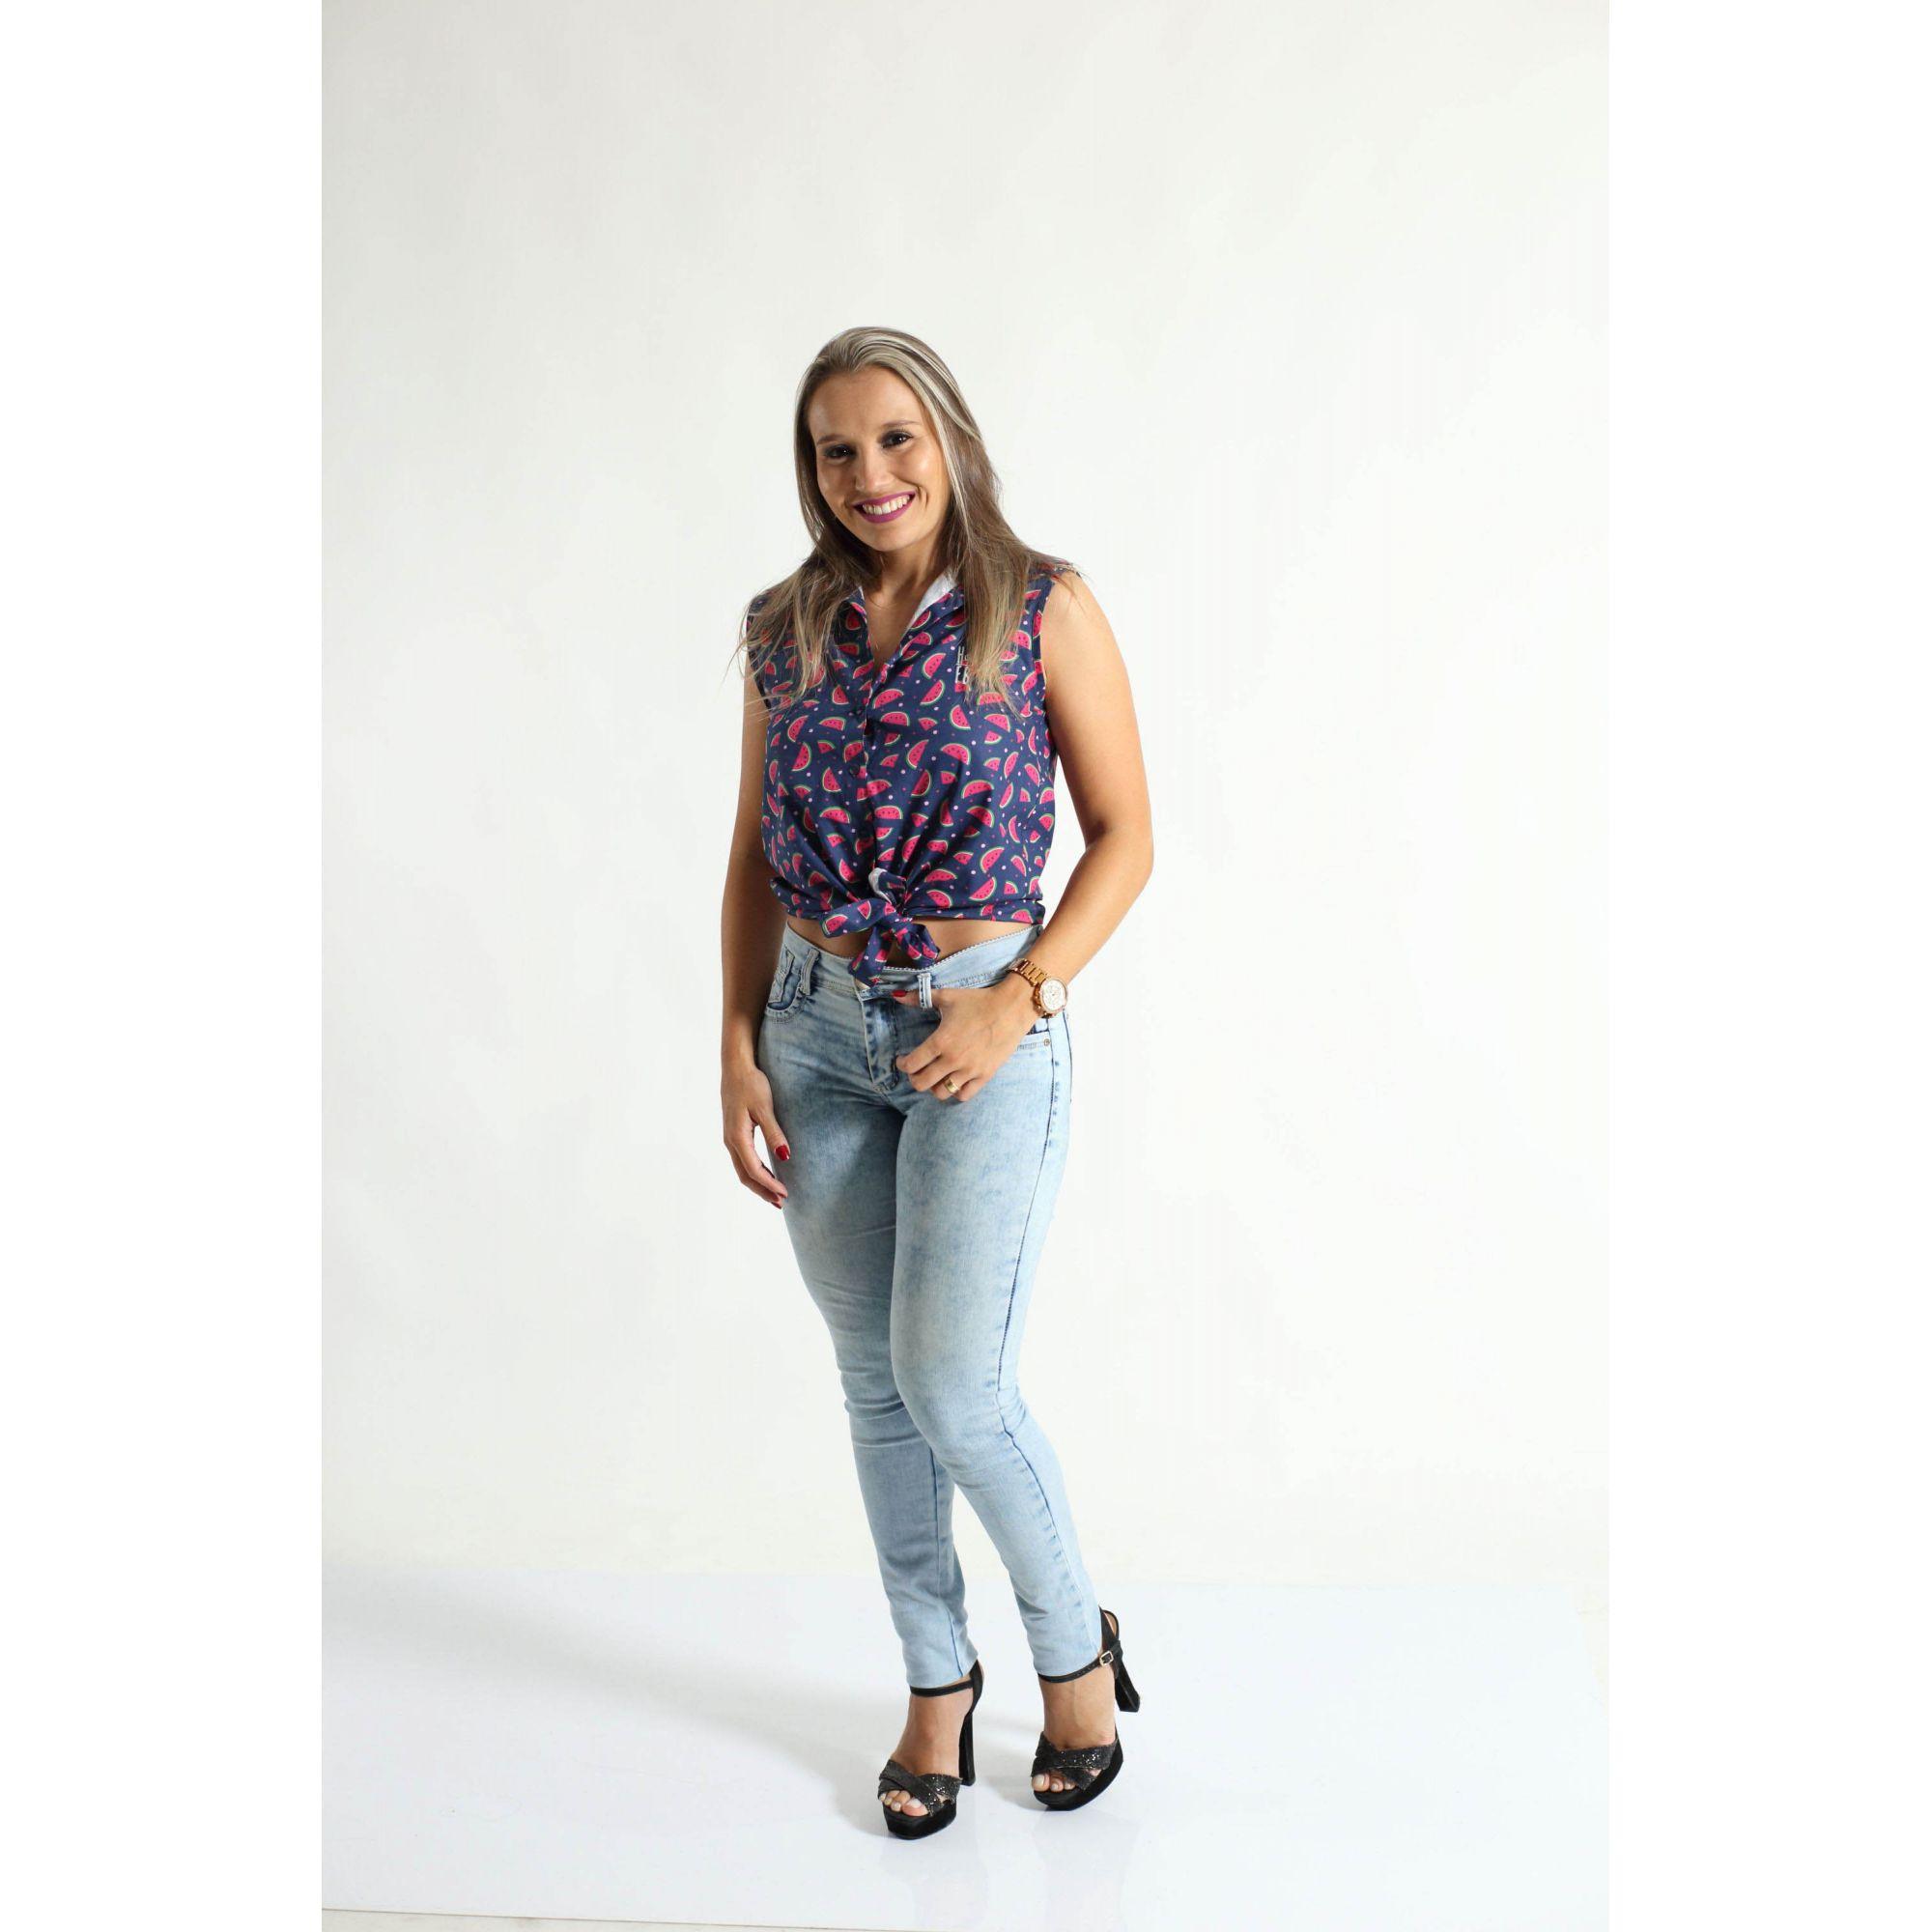 MÃE E FILHO > Kit 02 Camisas Social Adulto e Infantil Melancia [Coleção Tal Mãe Tal Filho]  - Heitor Fashion Brazil